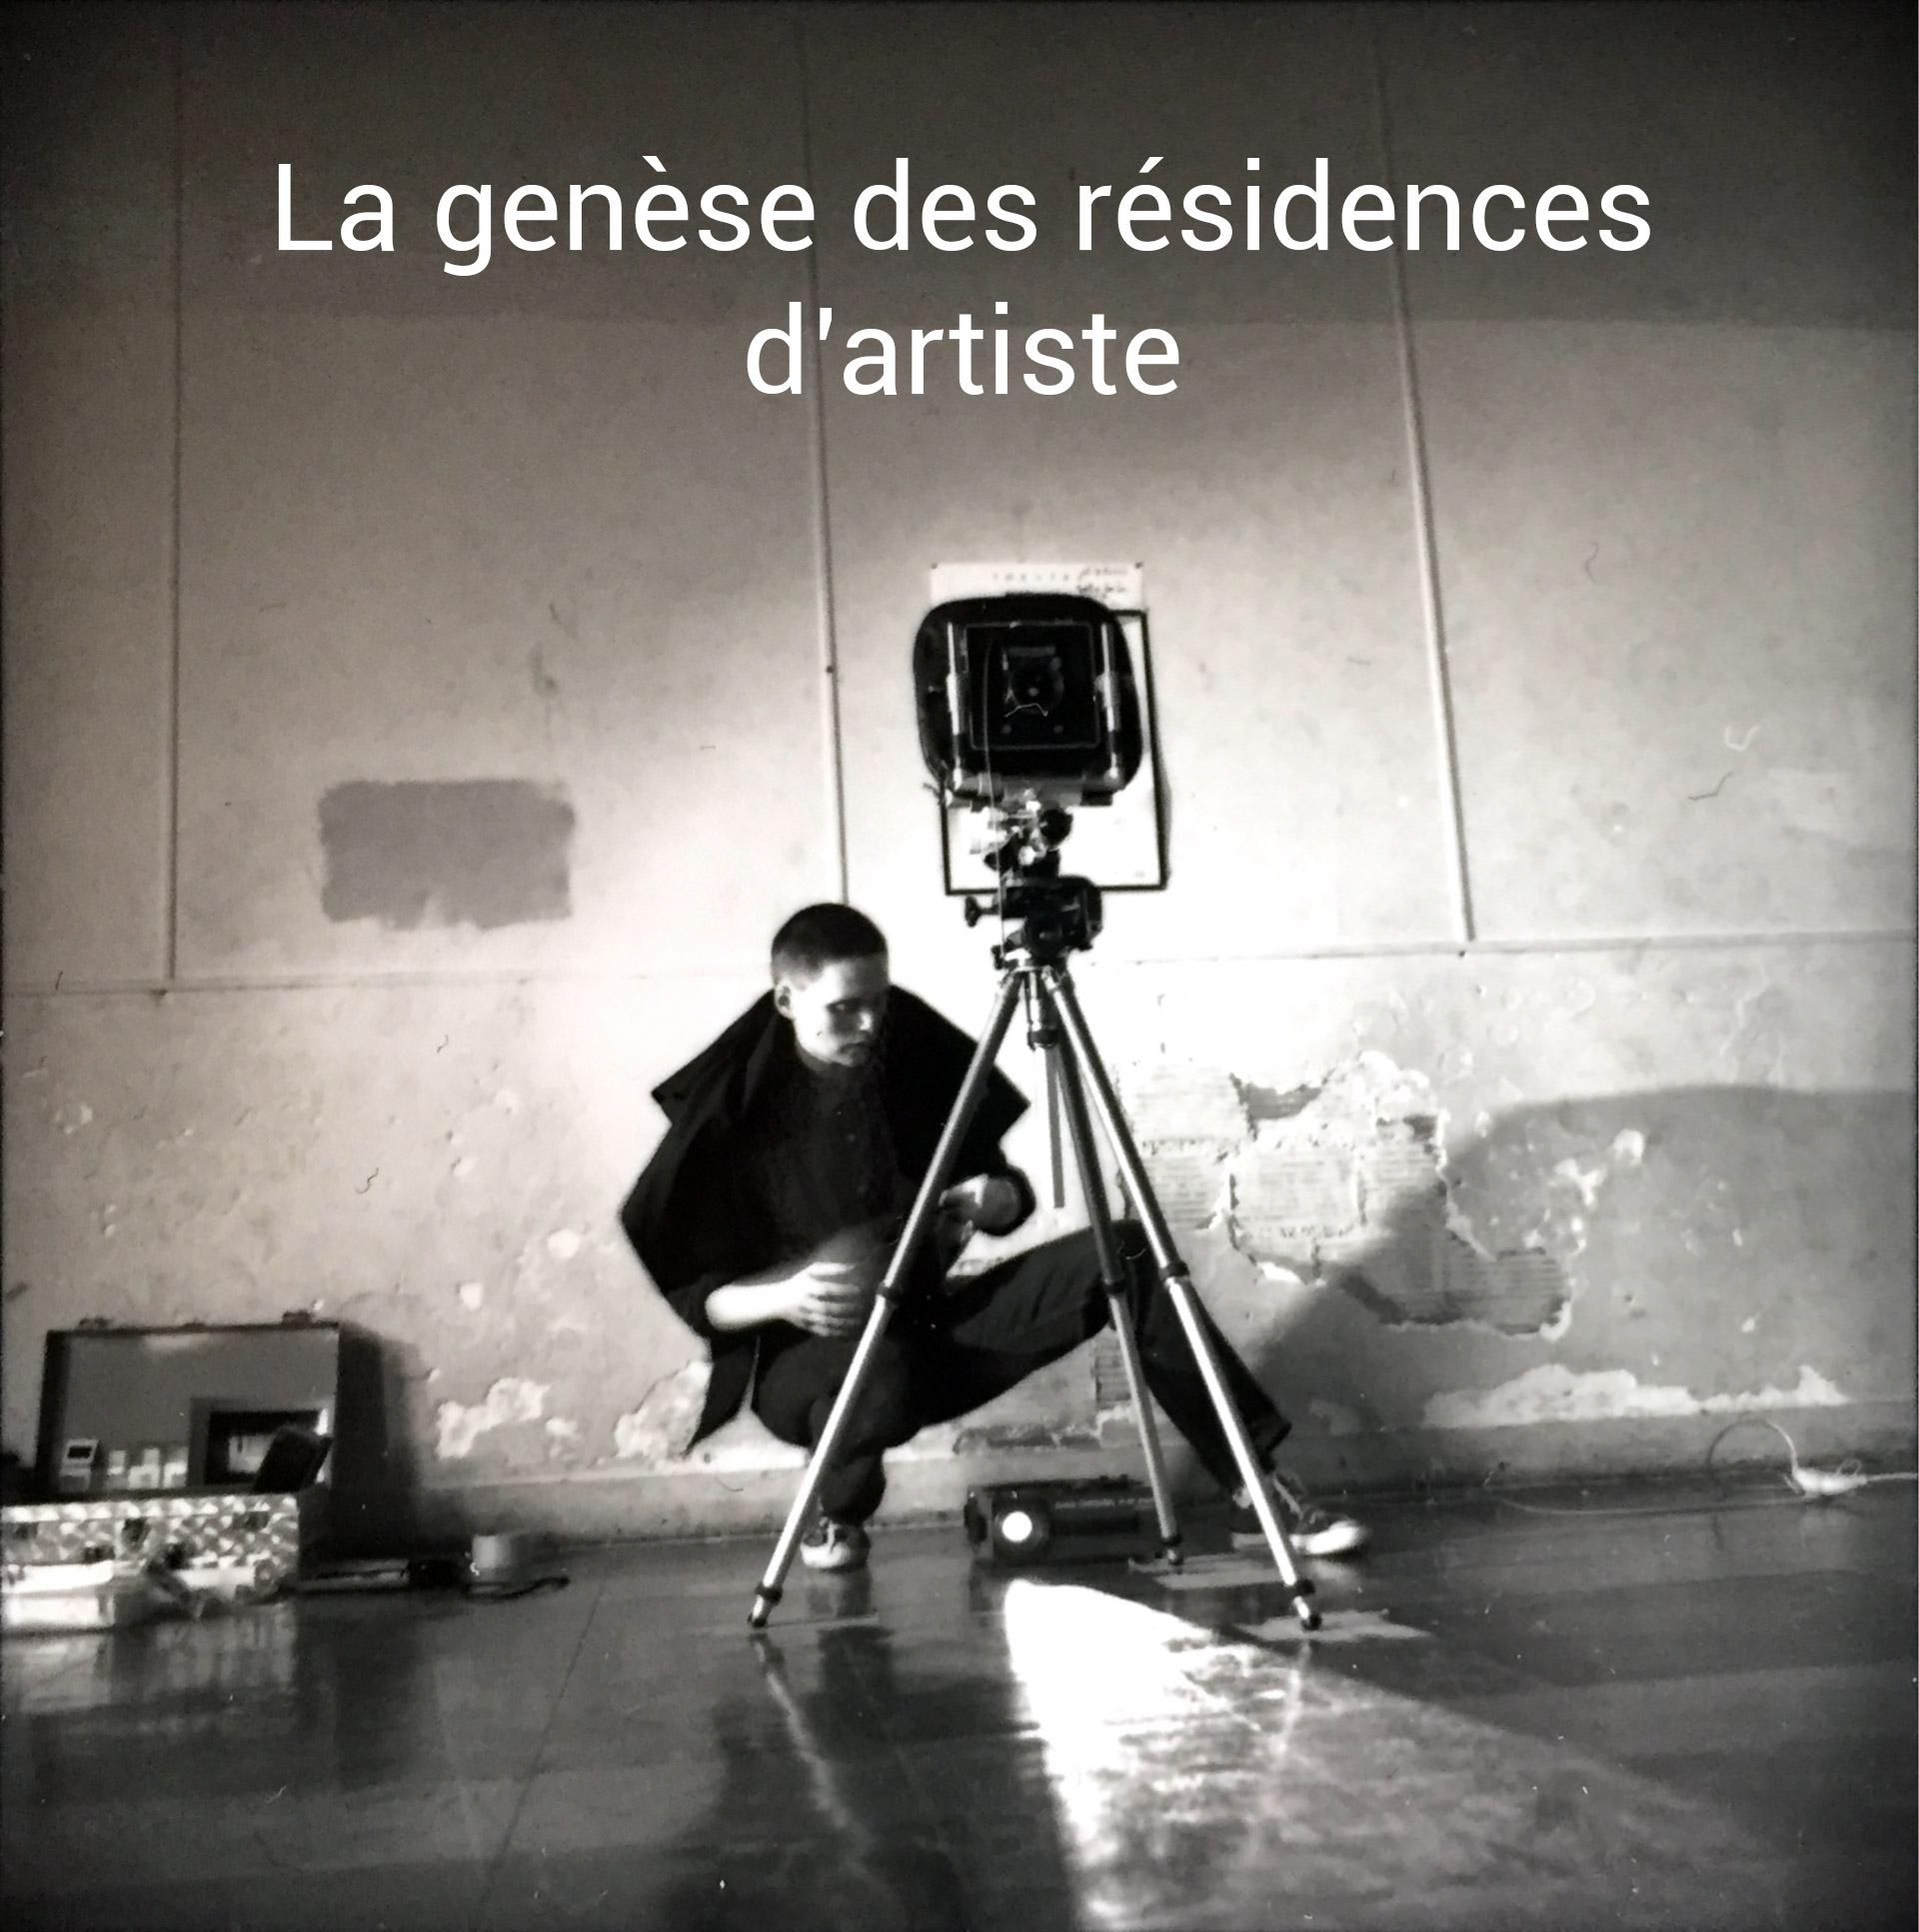 savoir-au-present-residences-artiste-genese